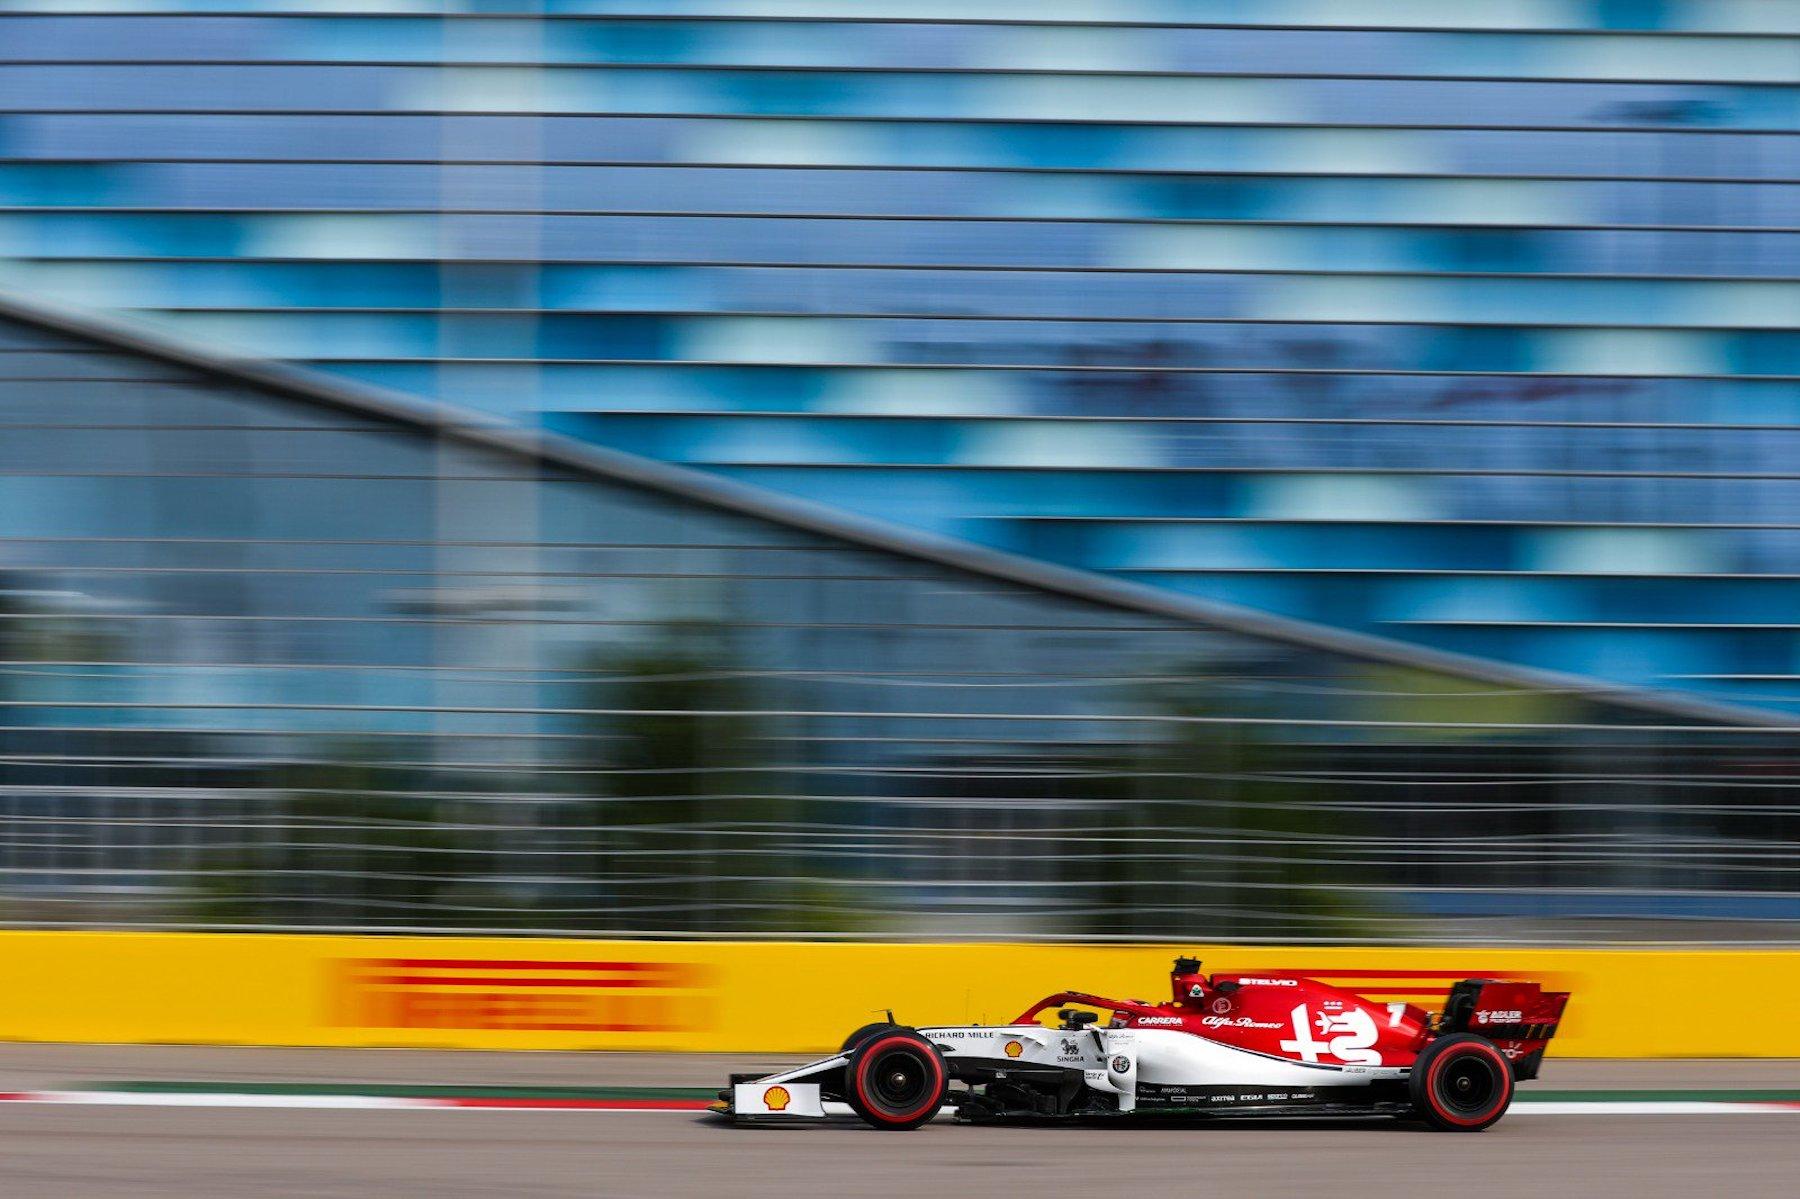 2 2019 Russian GP Friday 16.jpg